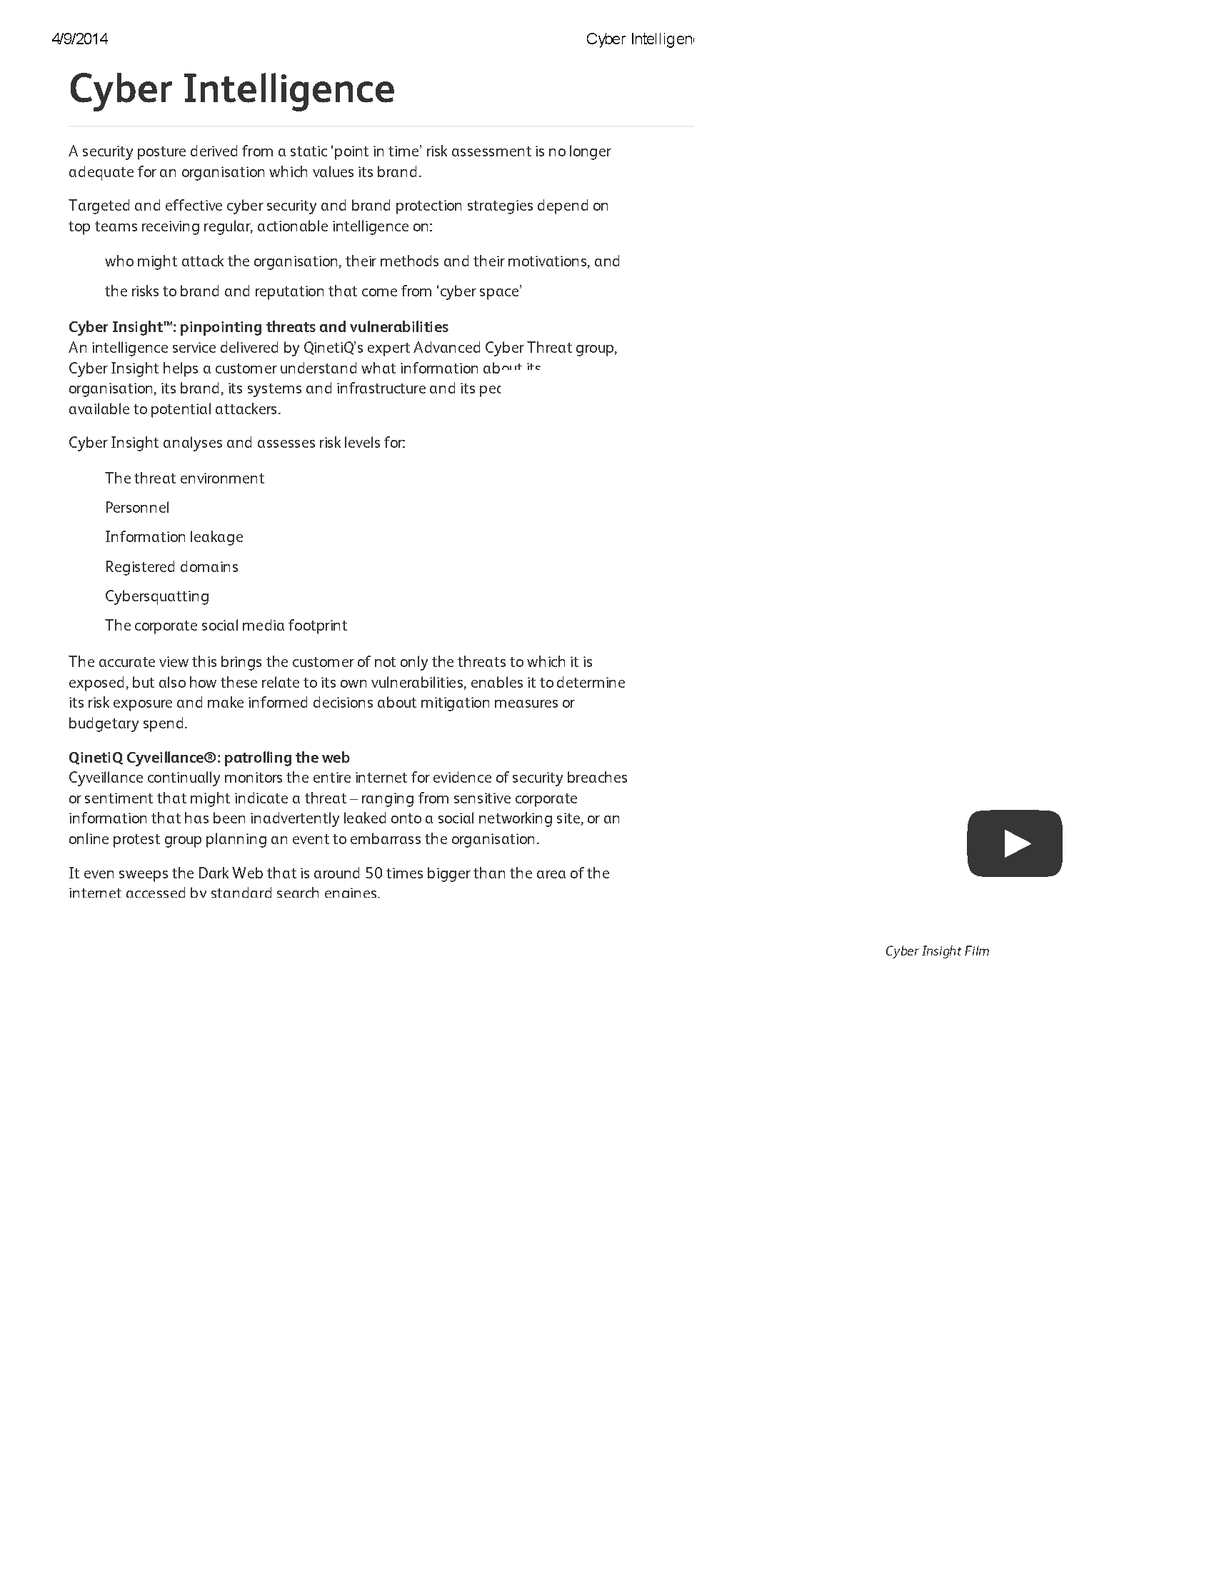 Calaméo - Cyber Security Jobs | Cyber Vigilance